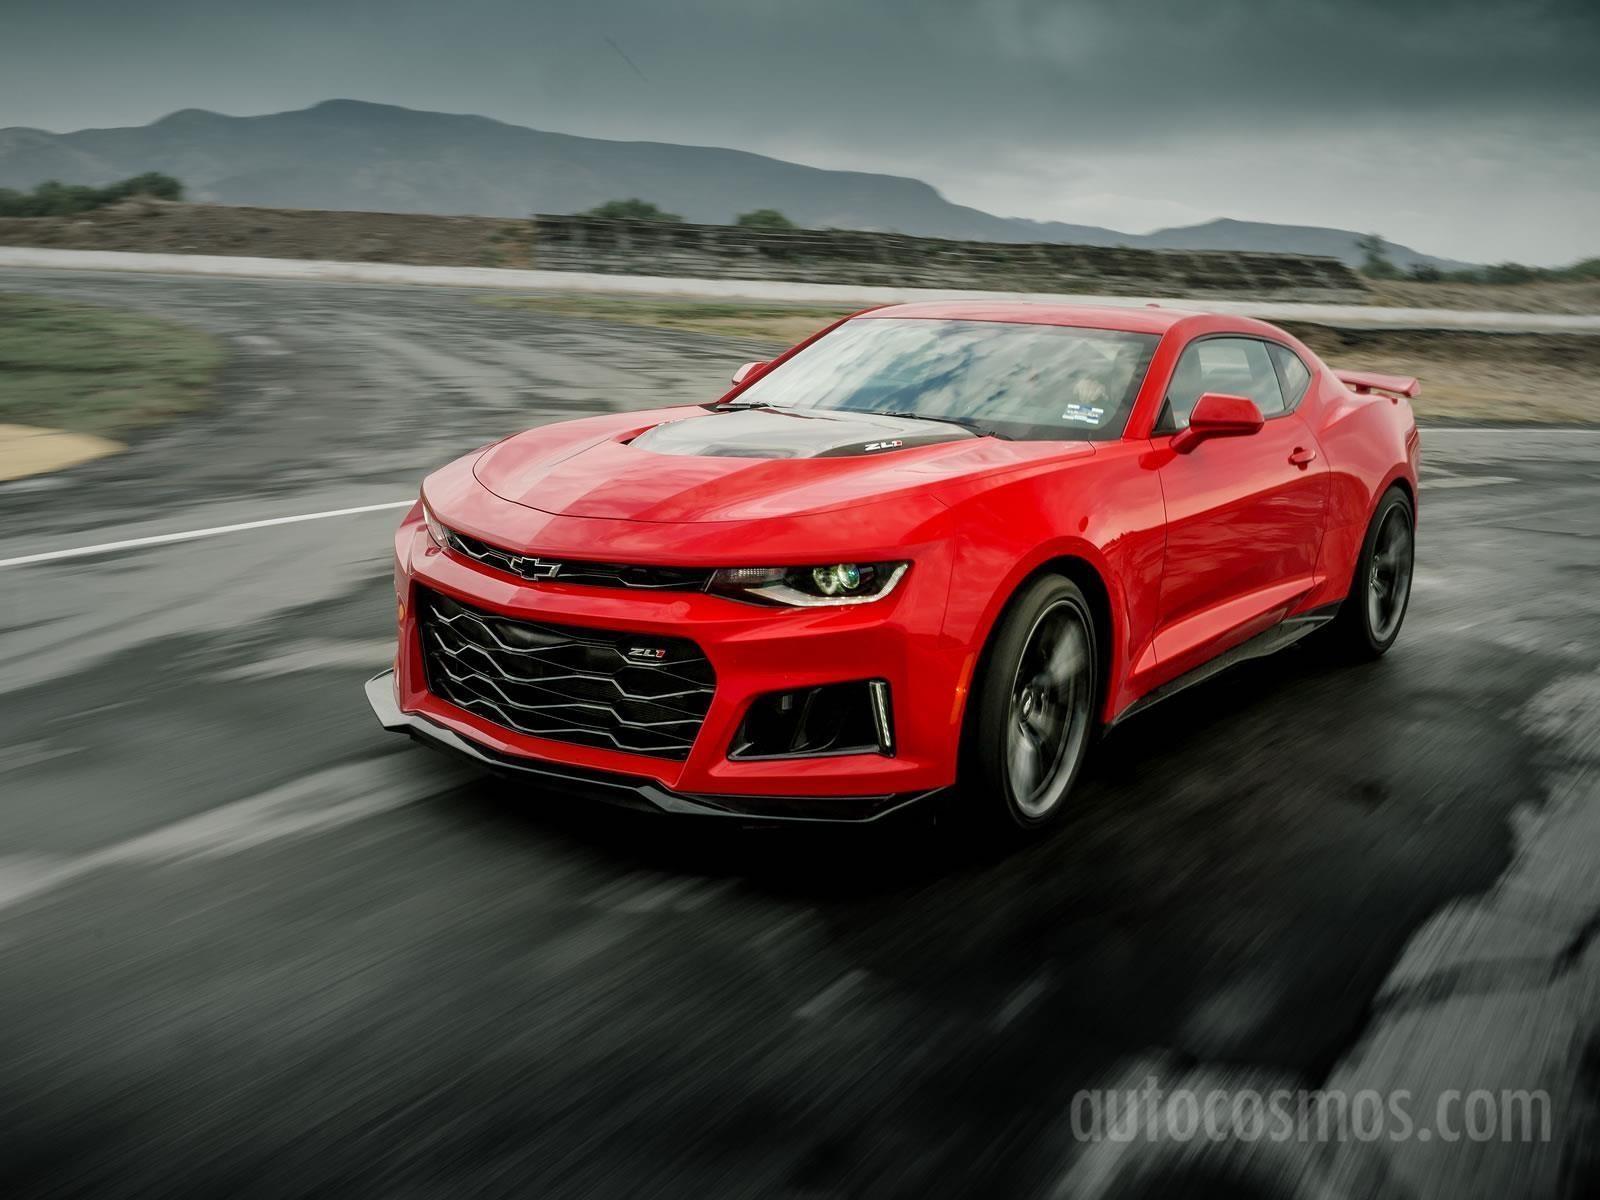 Chevrolet Camaro Zl1 2018 Prueba De Manejo Autocosmos Com